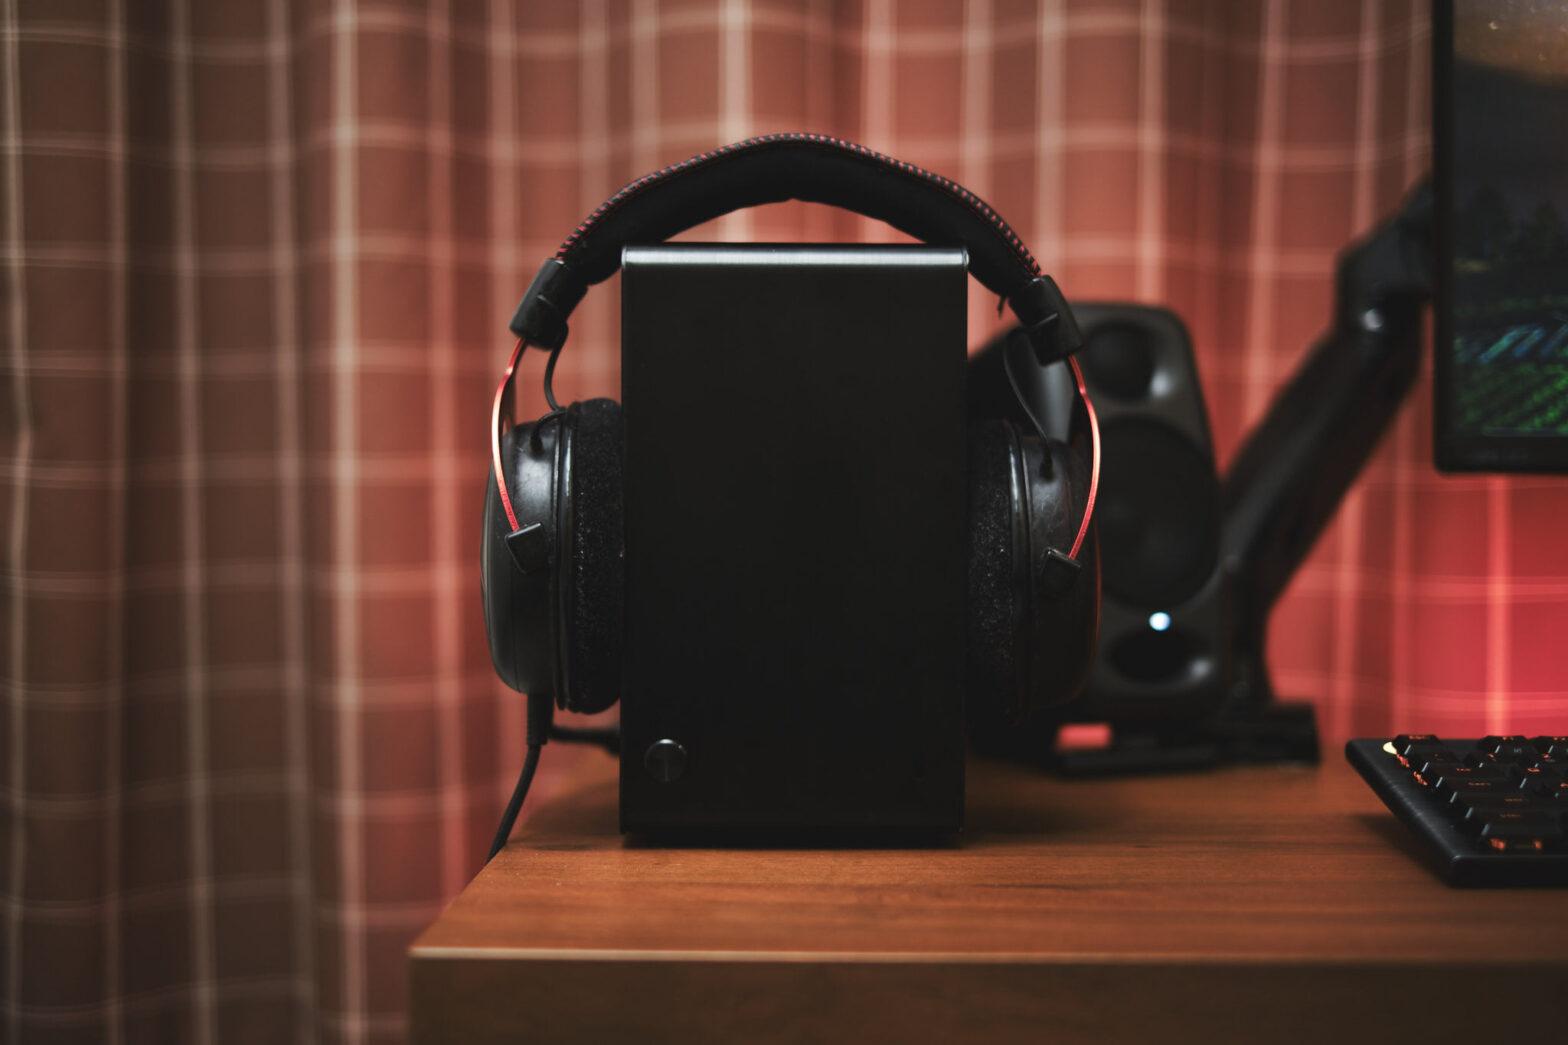 DAN A4 case size comparison with a headphone